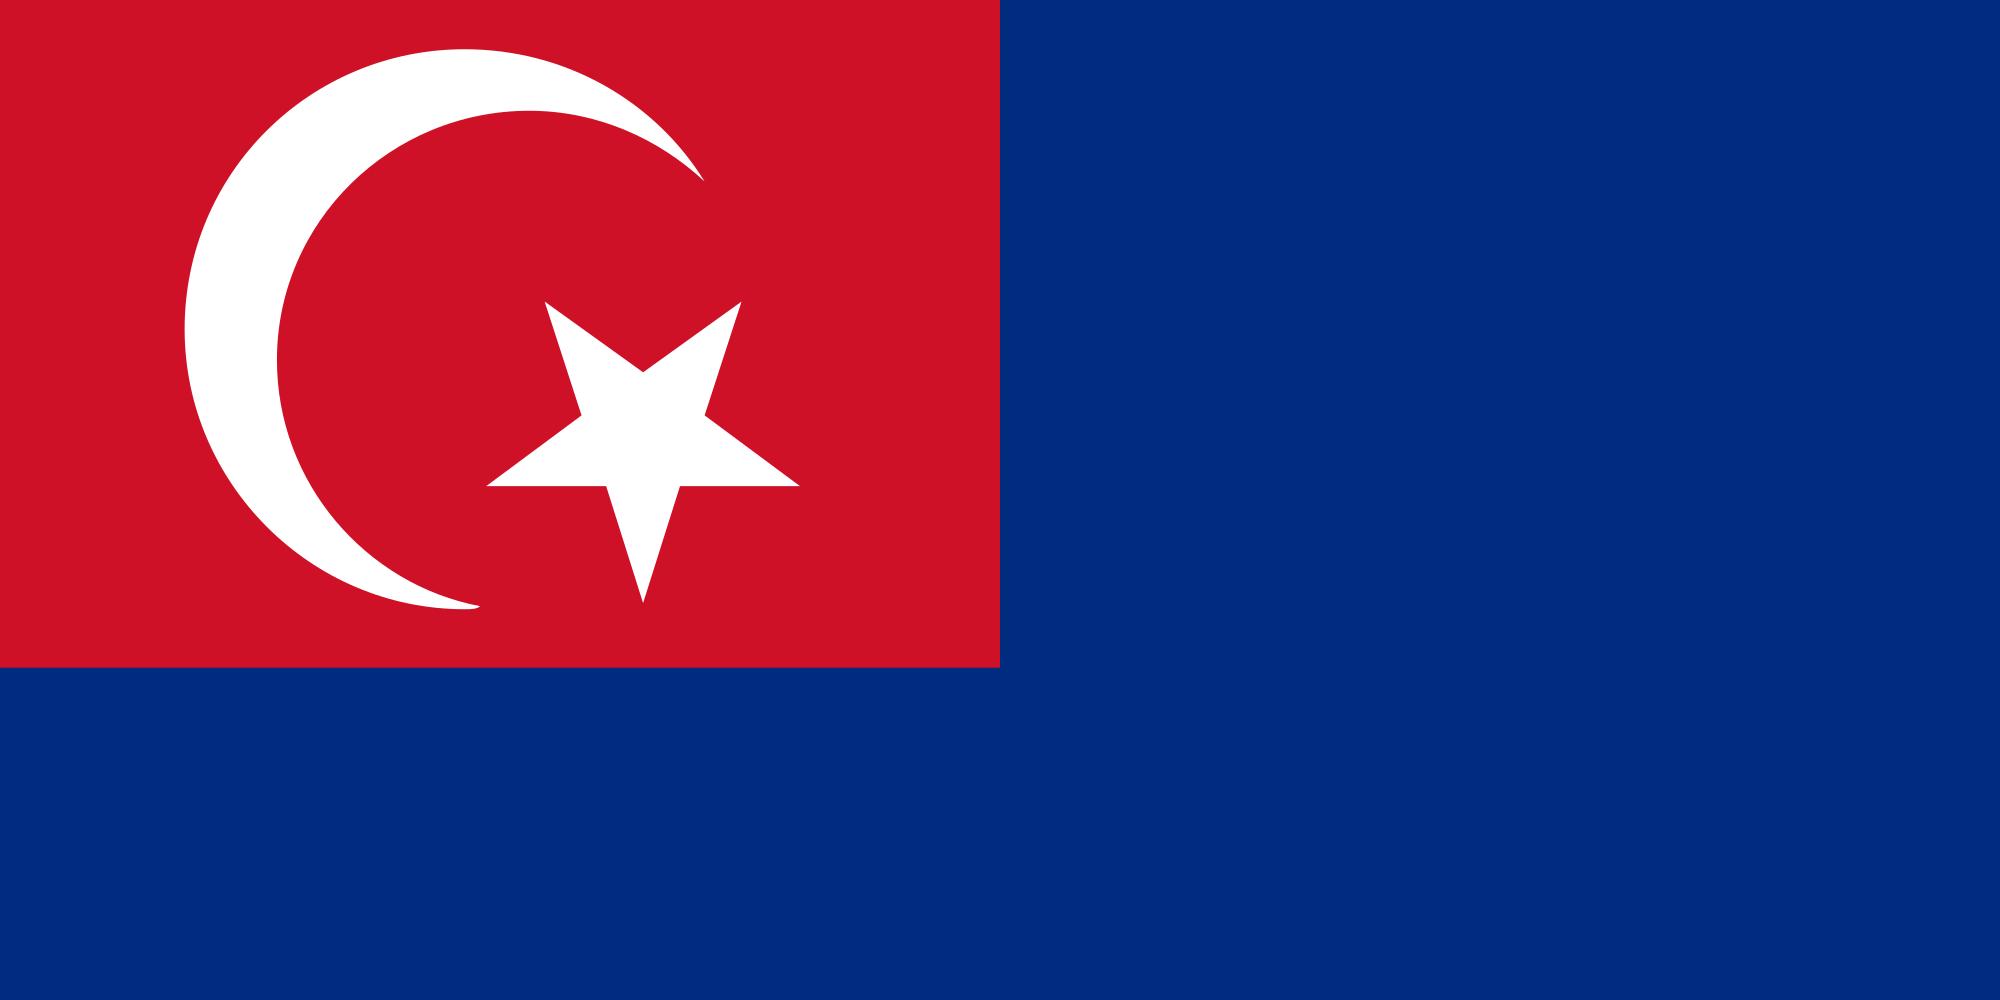 Gambar Bendera Negara Asian Games 2018